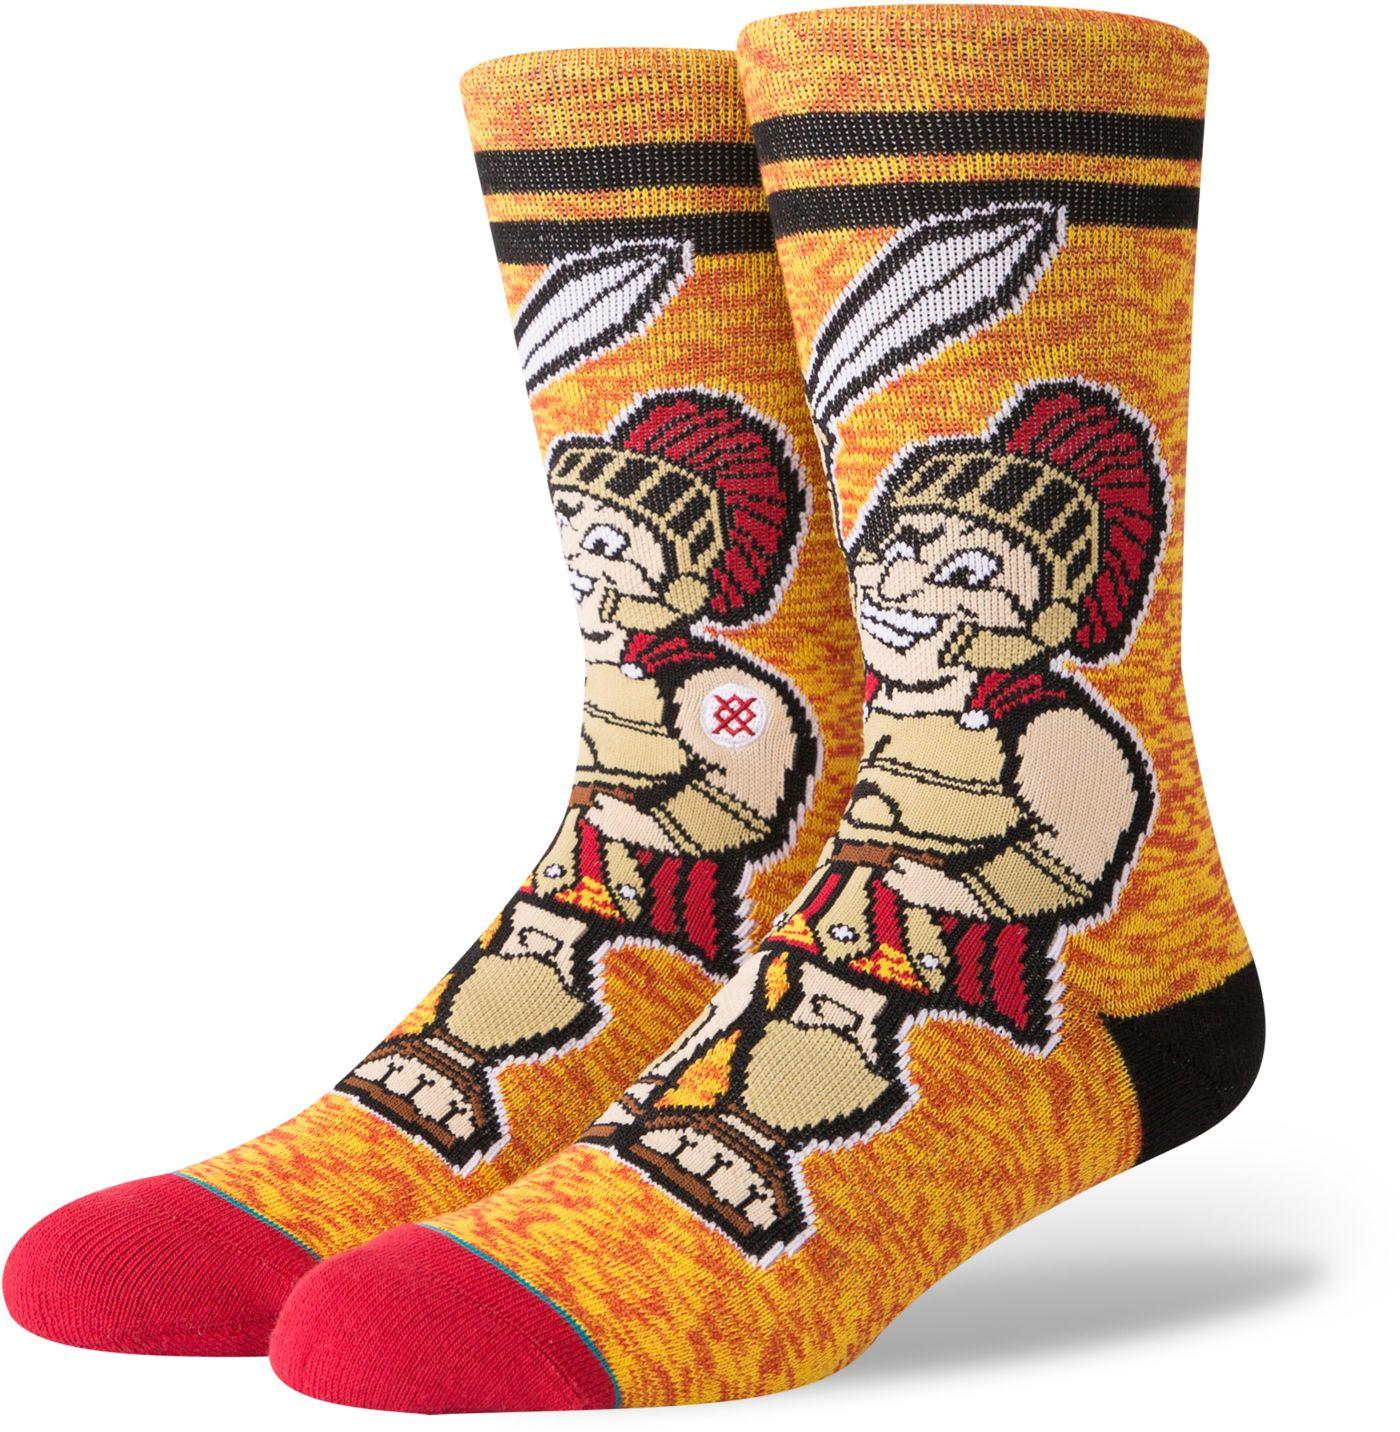 Stance USC Trojans Character Crew Socks